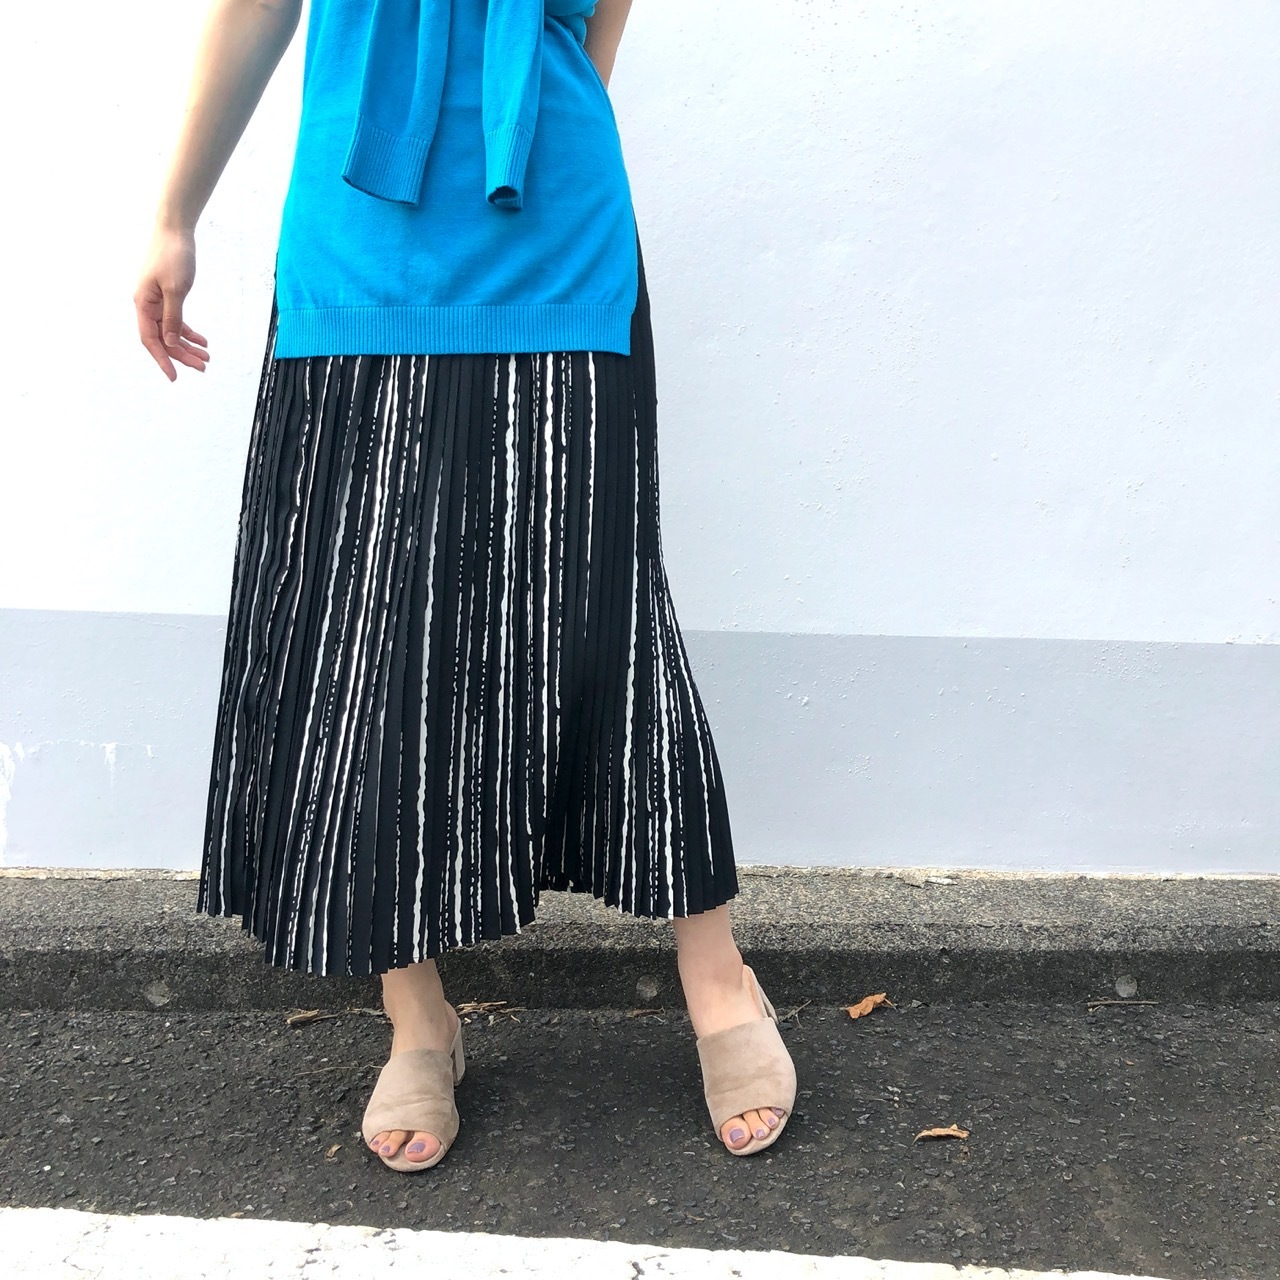 【 ROSIEE 】- R250212 - ストライププリーツスカート